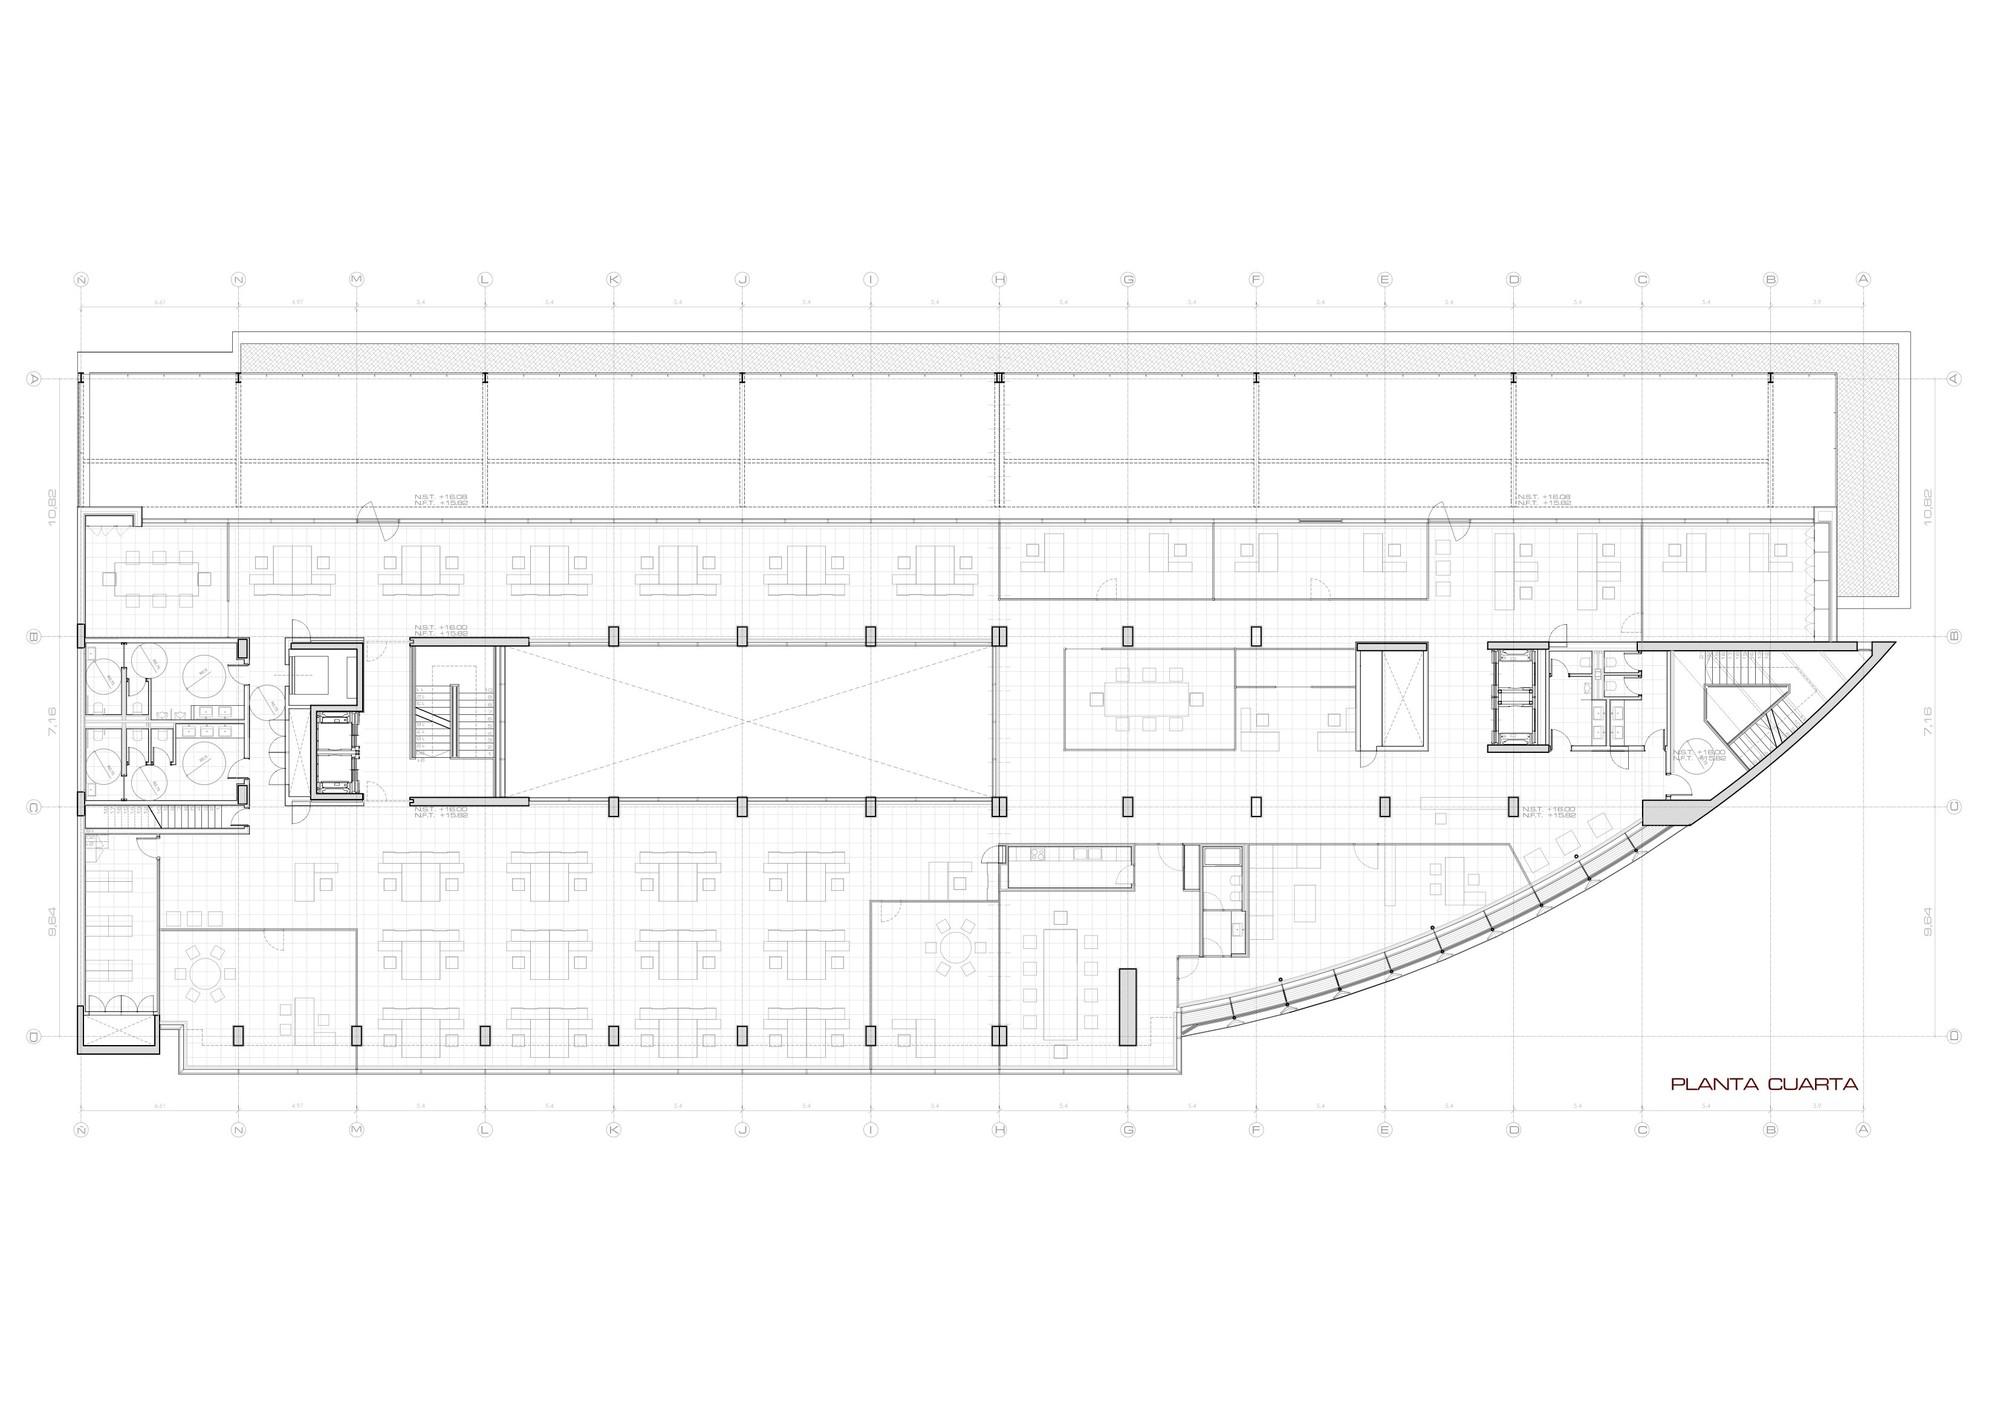 Galer a de edificio de oficinas en vitoria lh14 arquitectos 15 - Arquitectos en vitoria ...